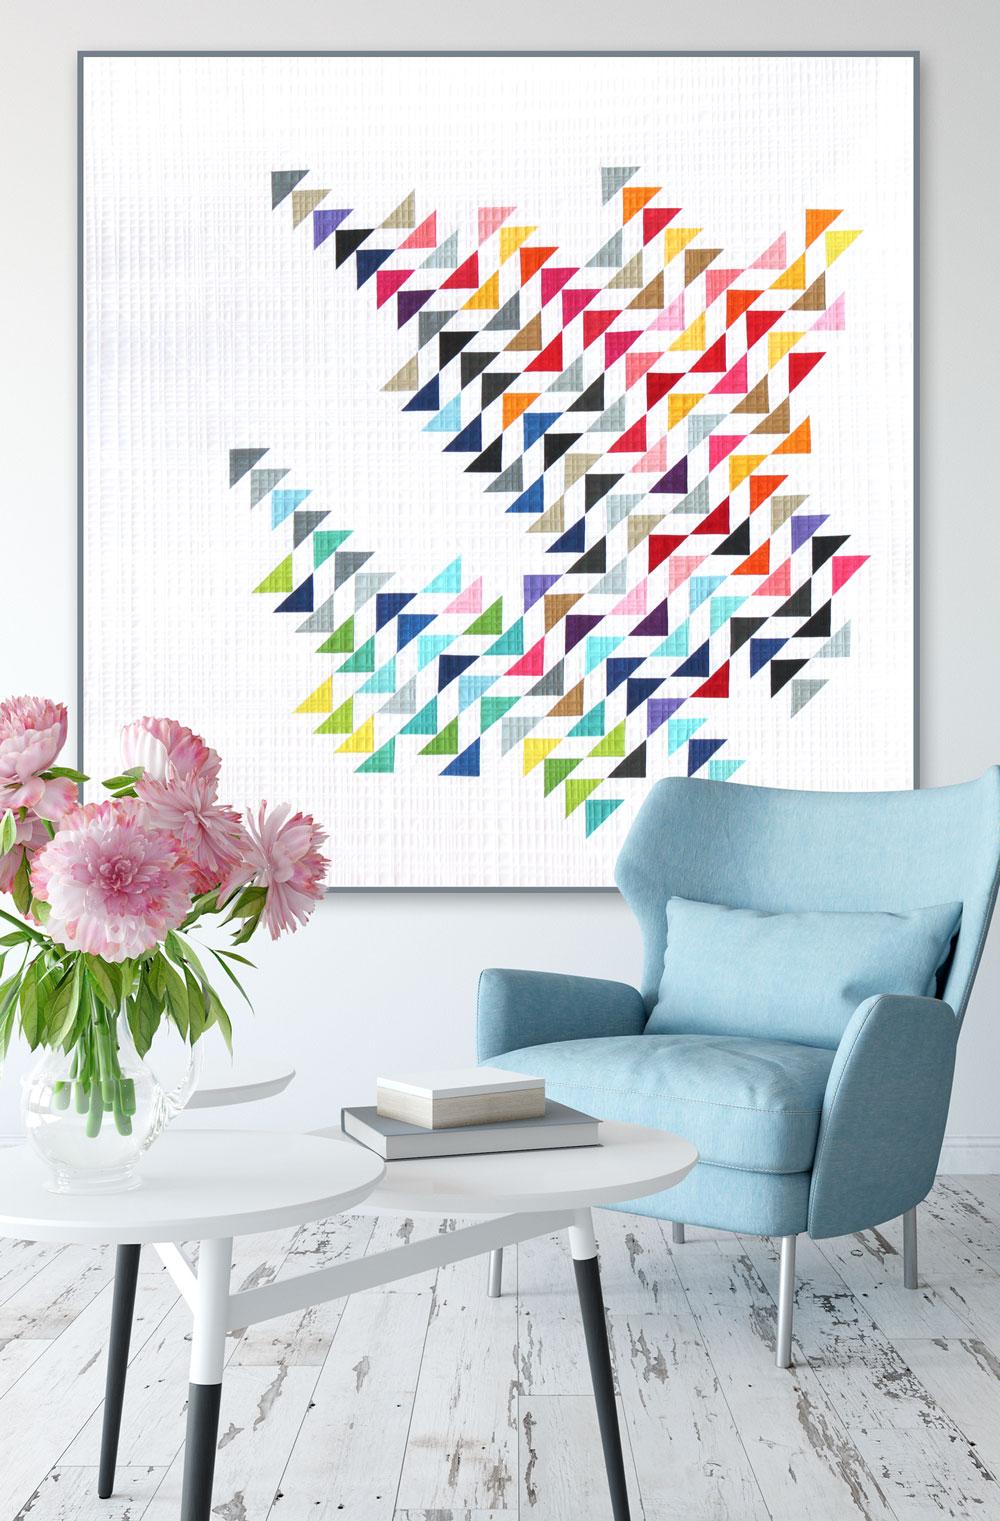 sky-quilt-pattern-by-zen-chic.jpg